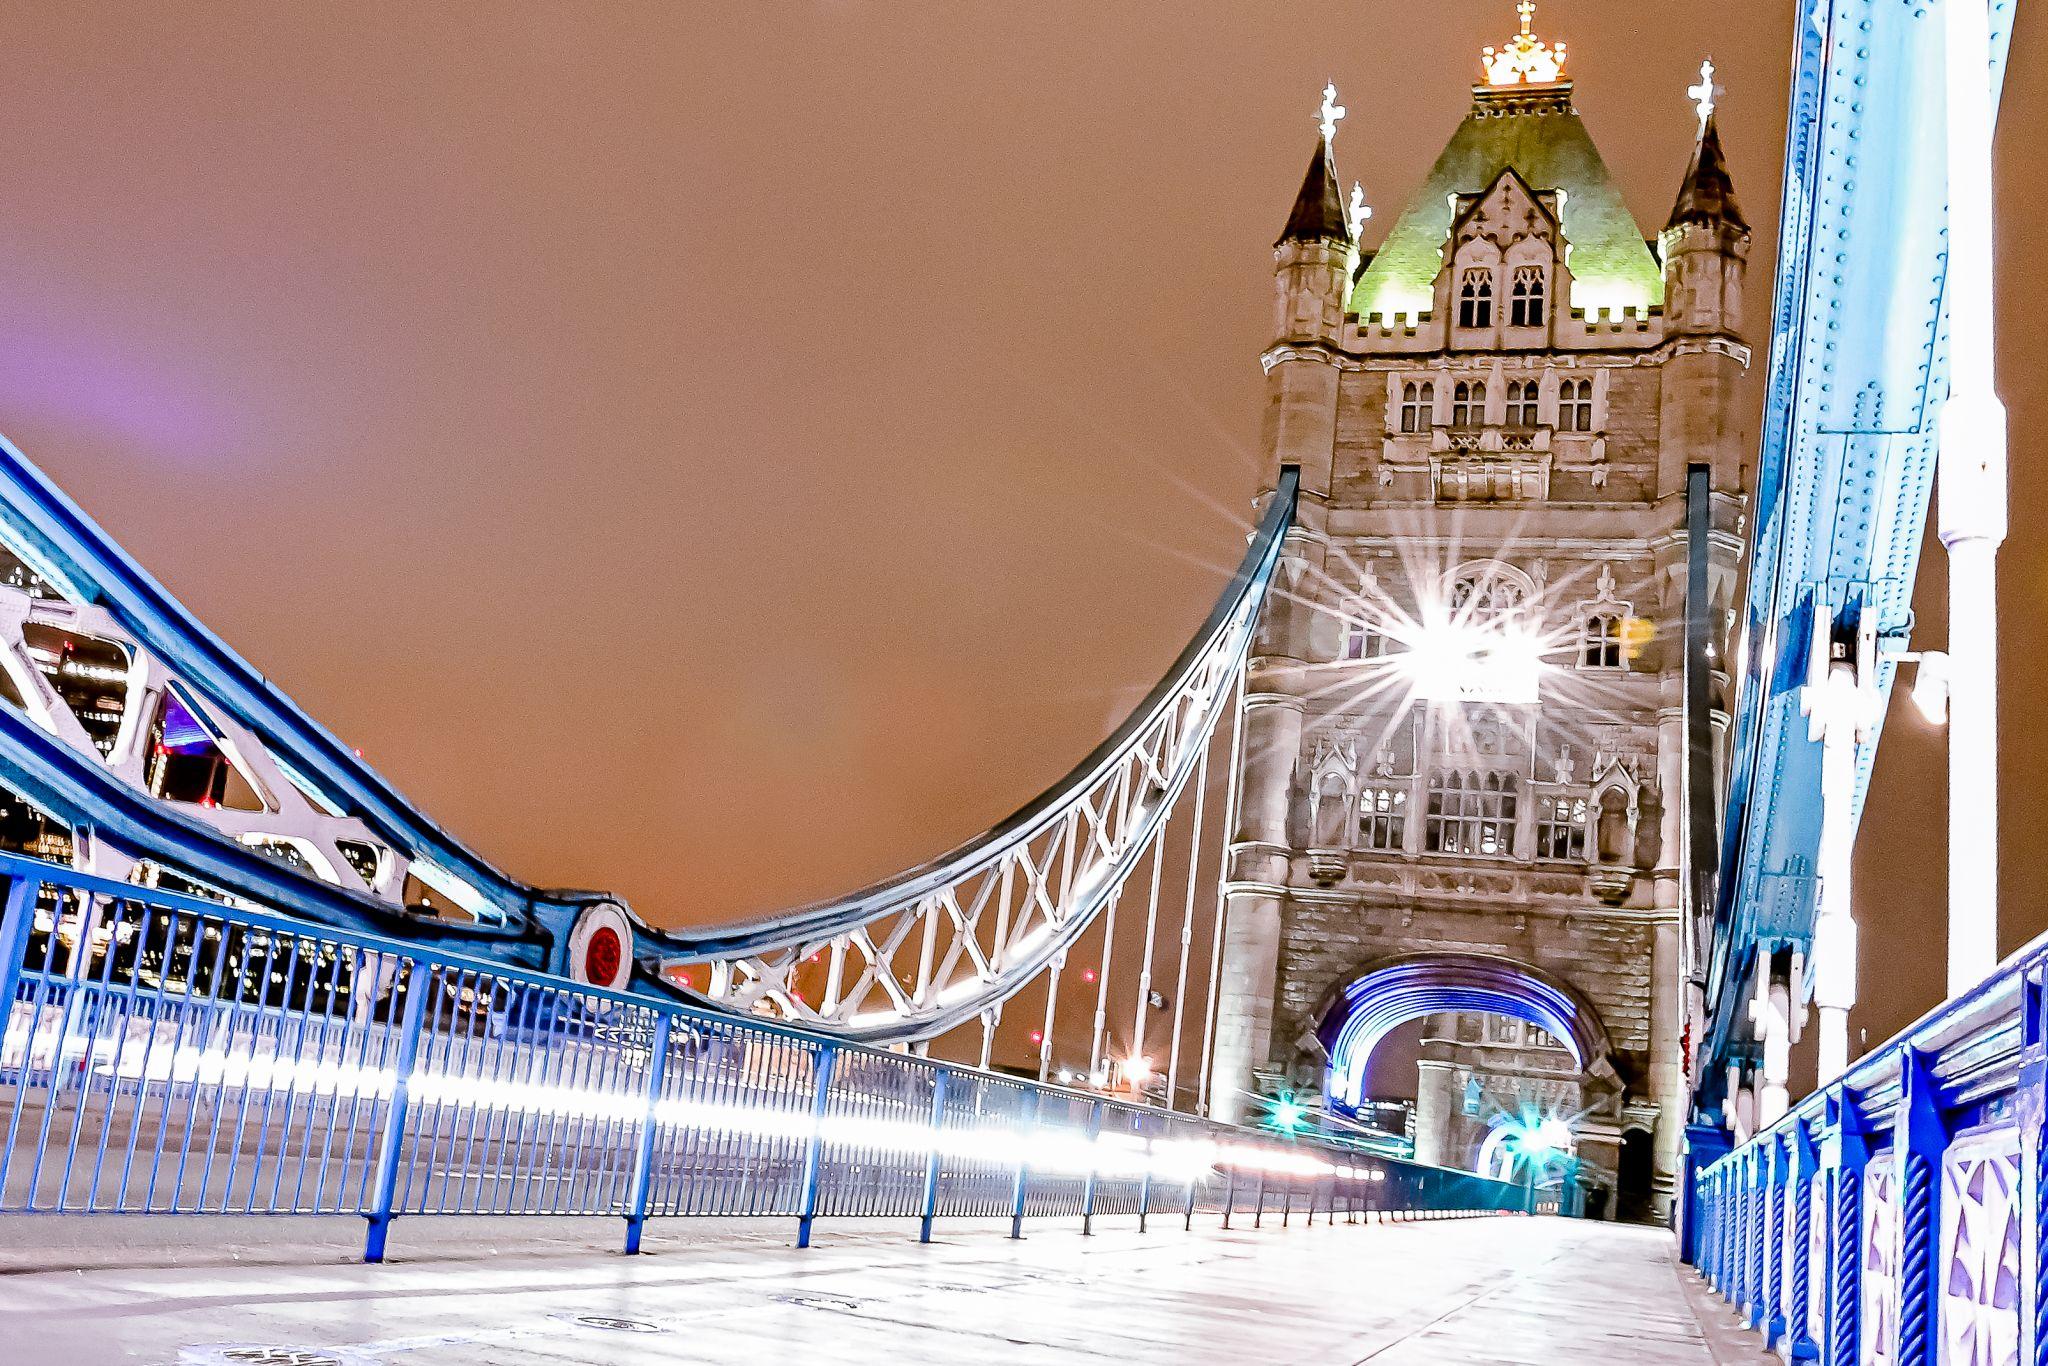 London Tower Bridge, United Kingdom